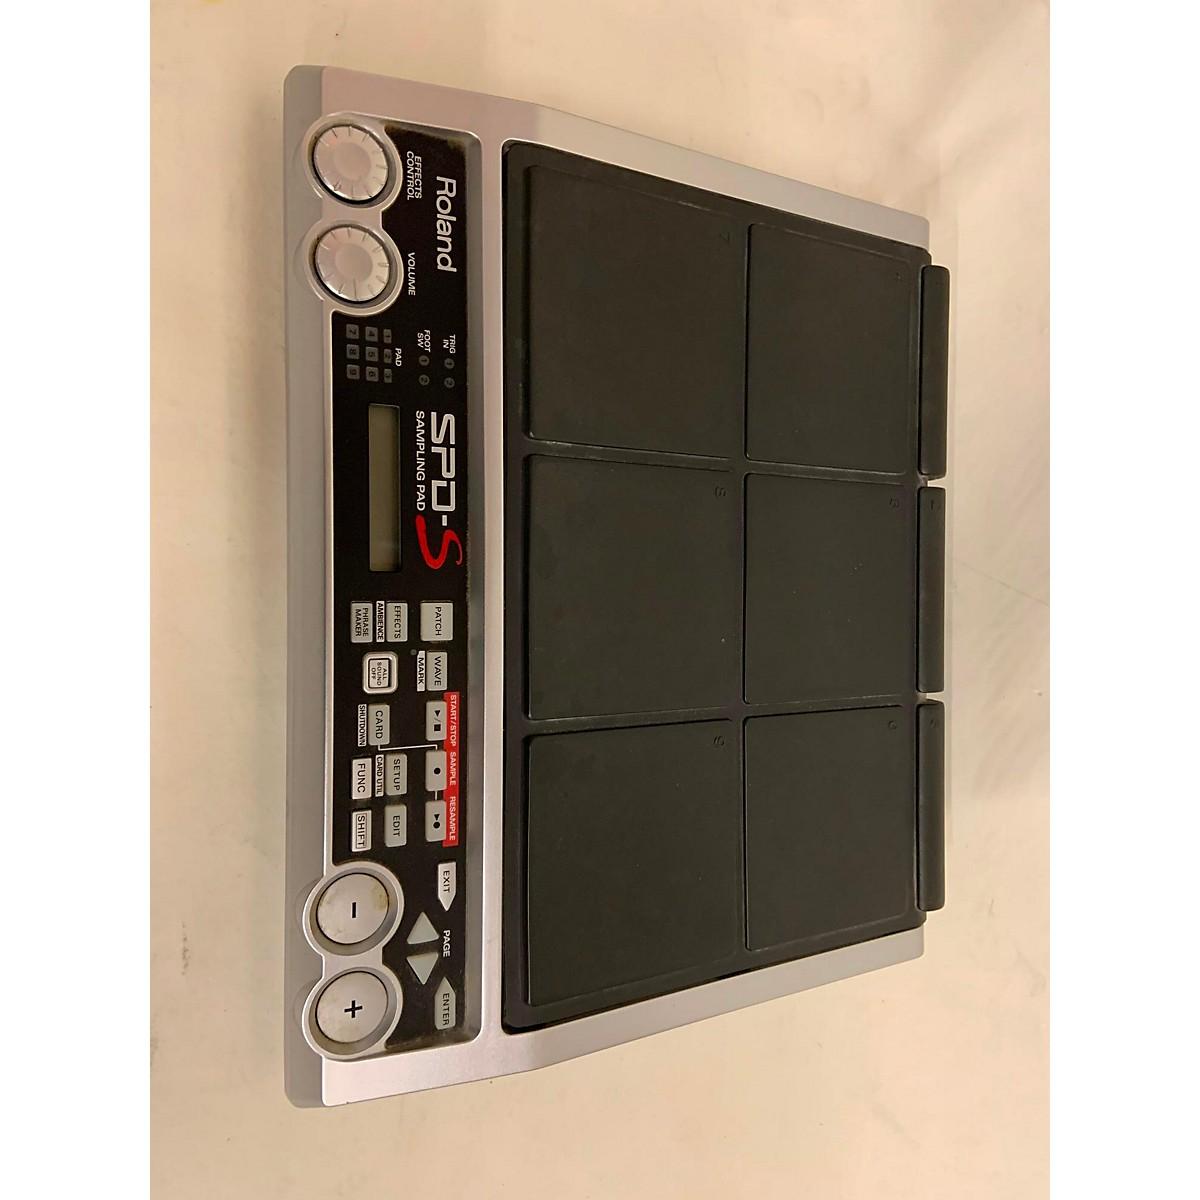 Roland SPDS Sampling Drum MIDI Controller